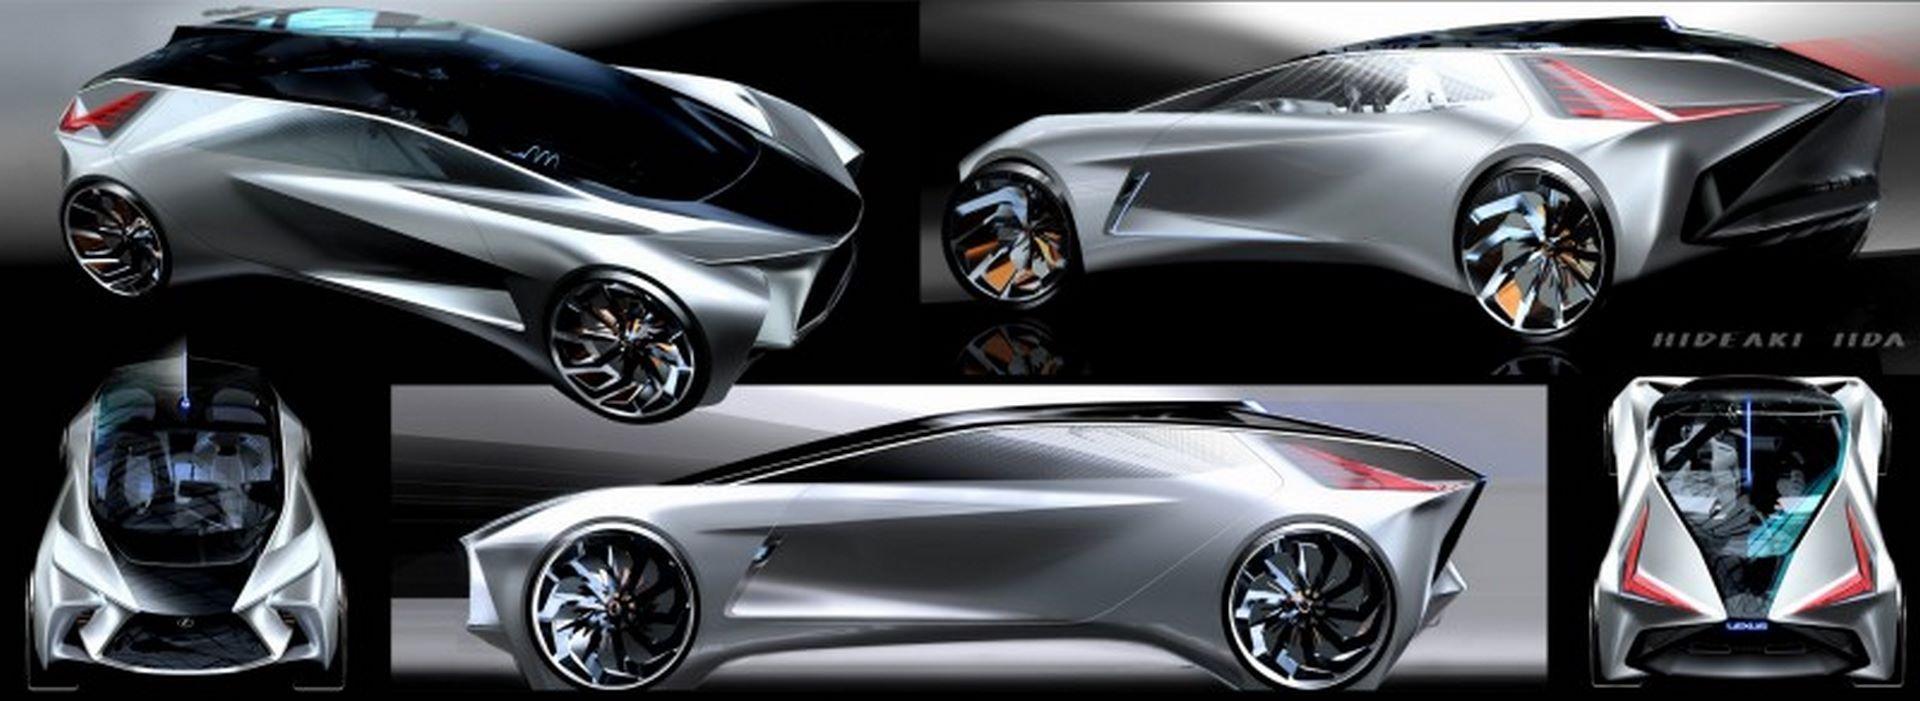 Lexus-LF-30-Concept-75